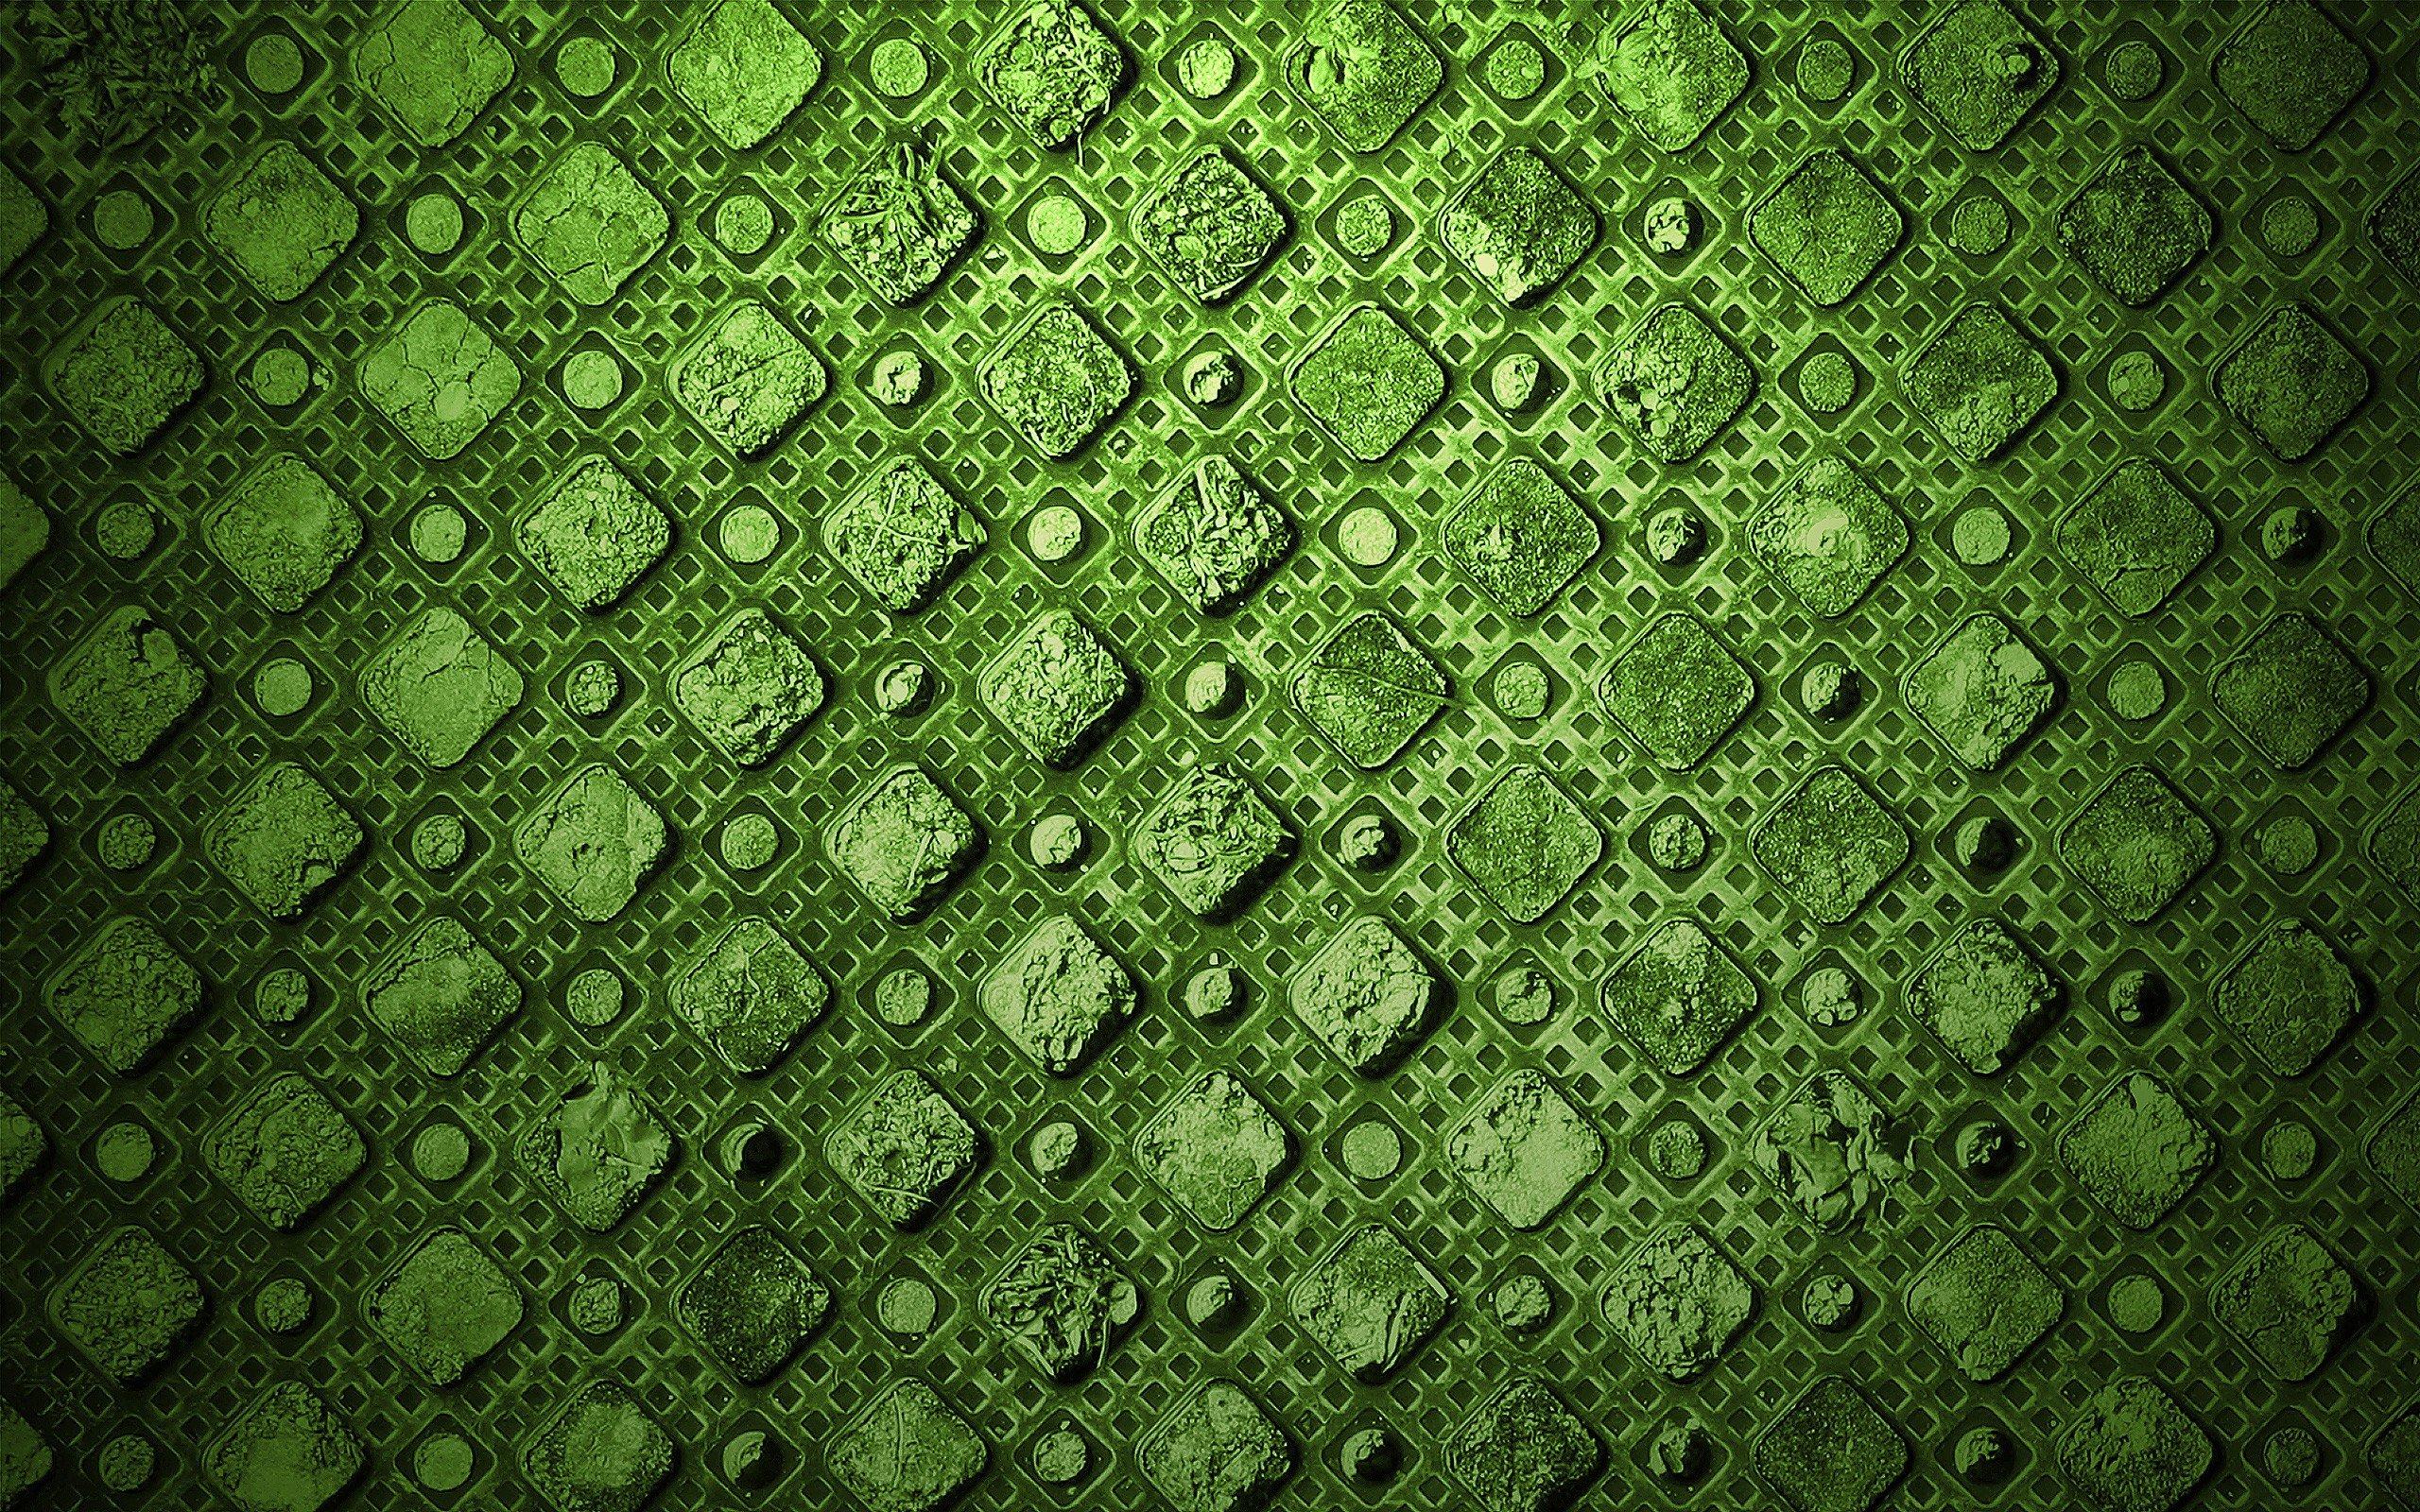 Green Abstract Textures Diamonds Wallpaper